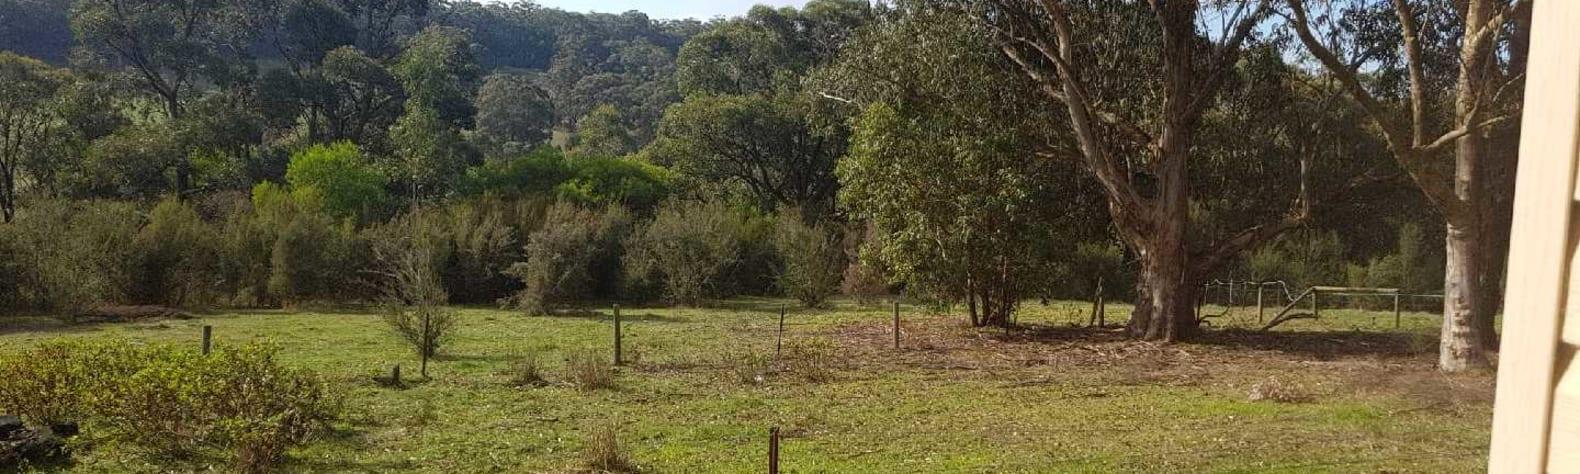 Hideaway Valley Farm